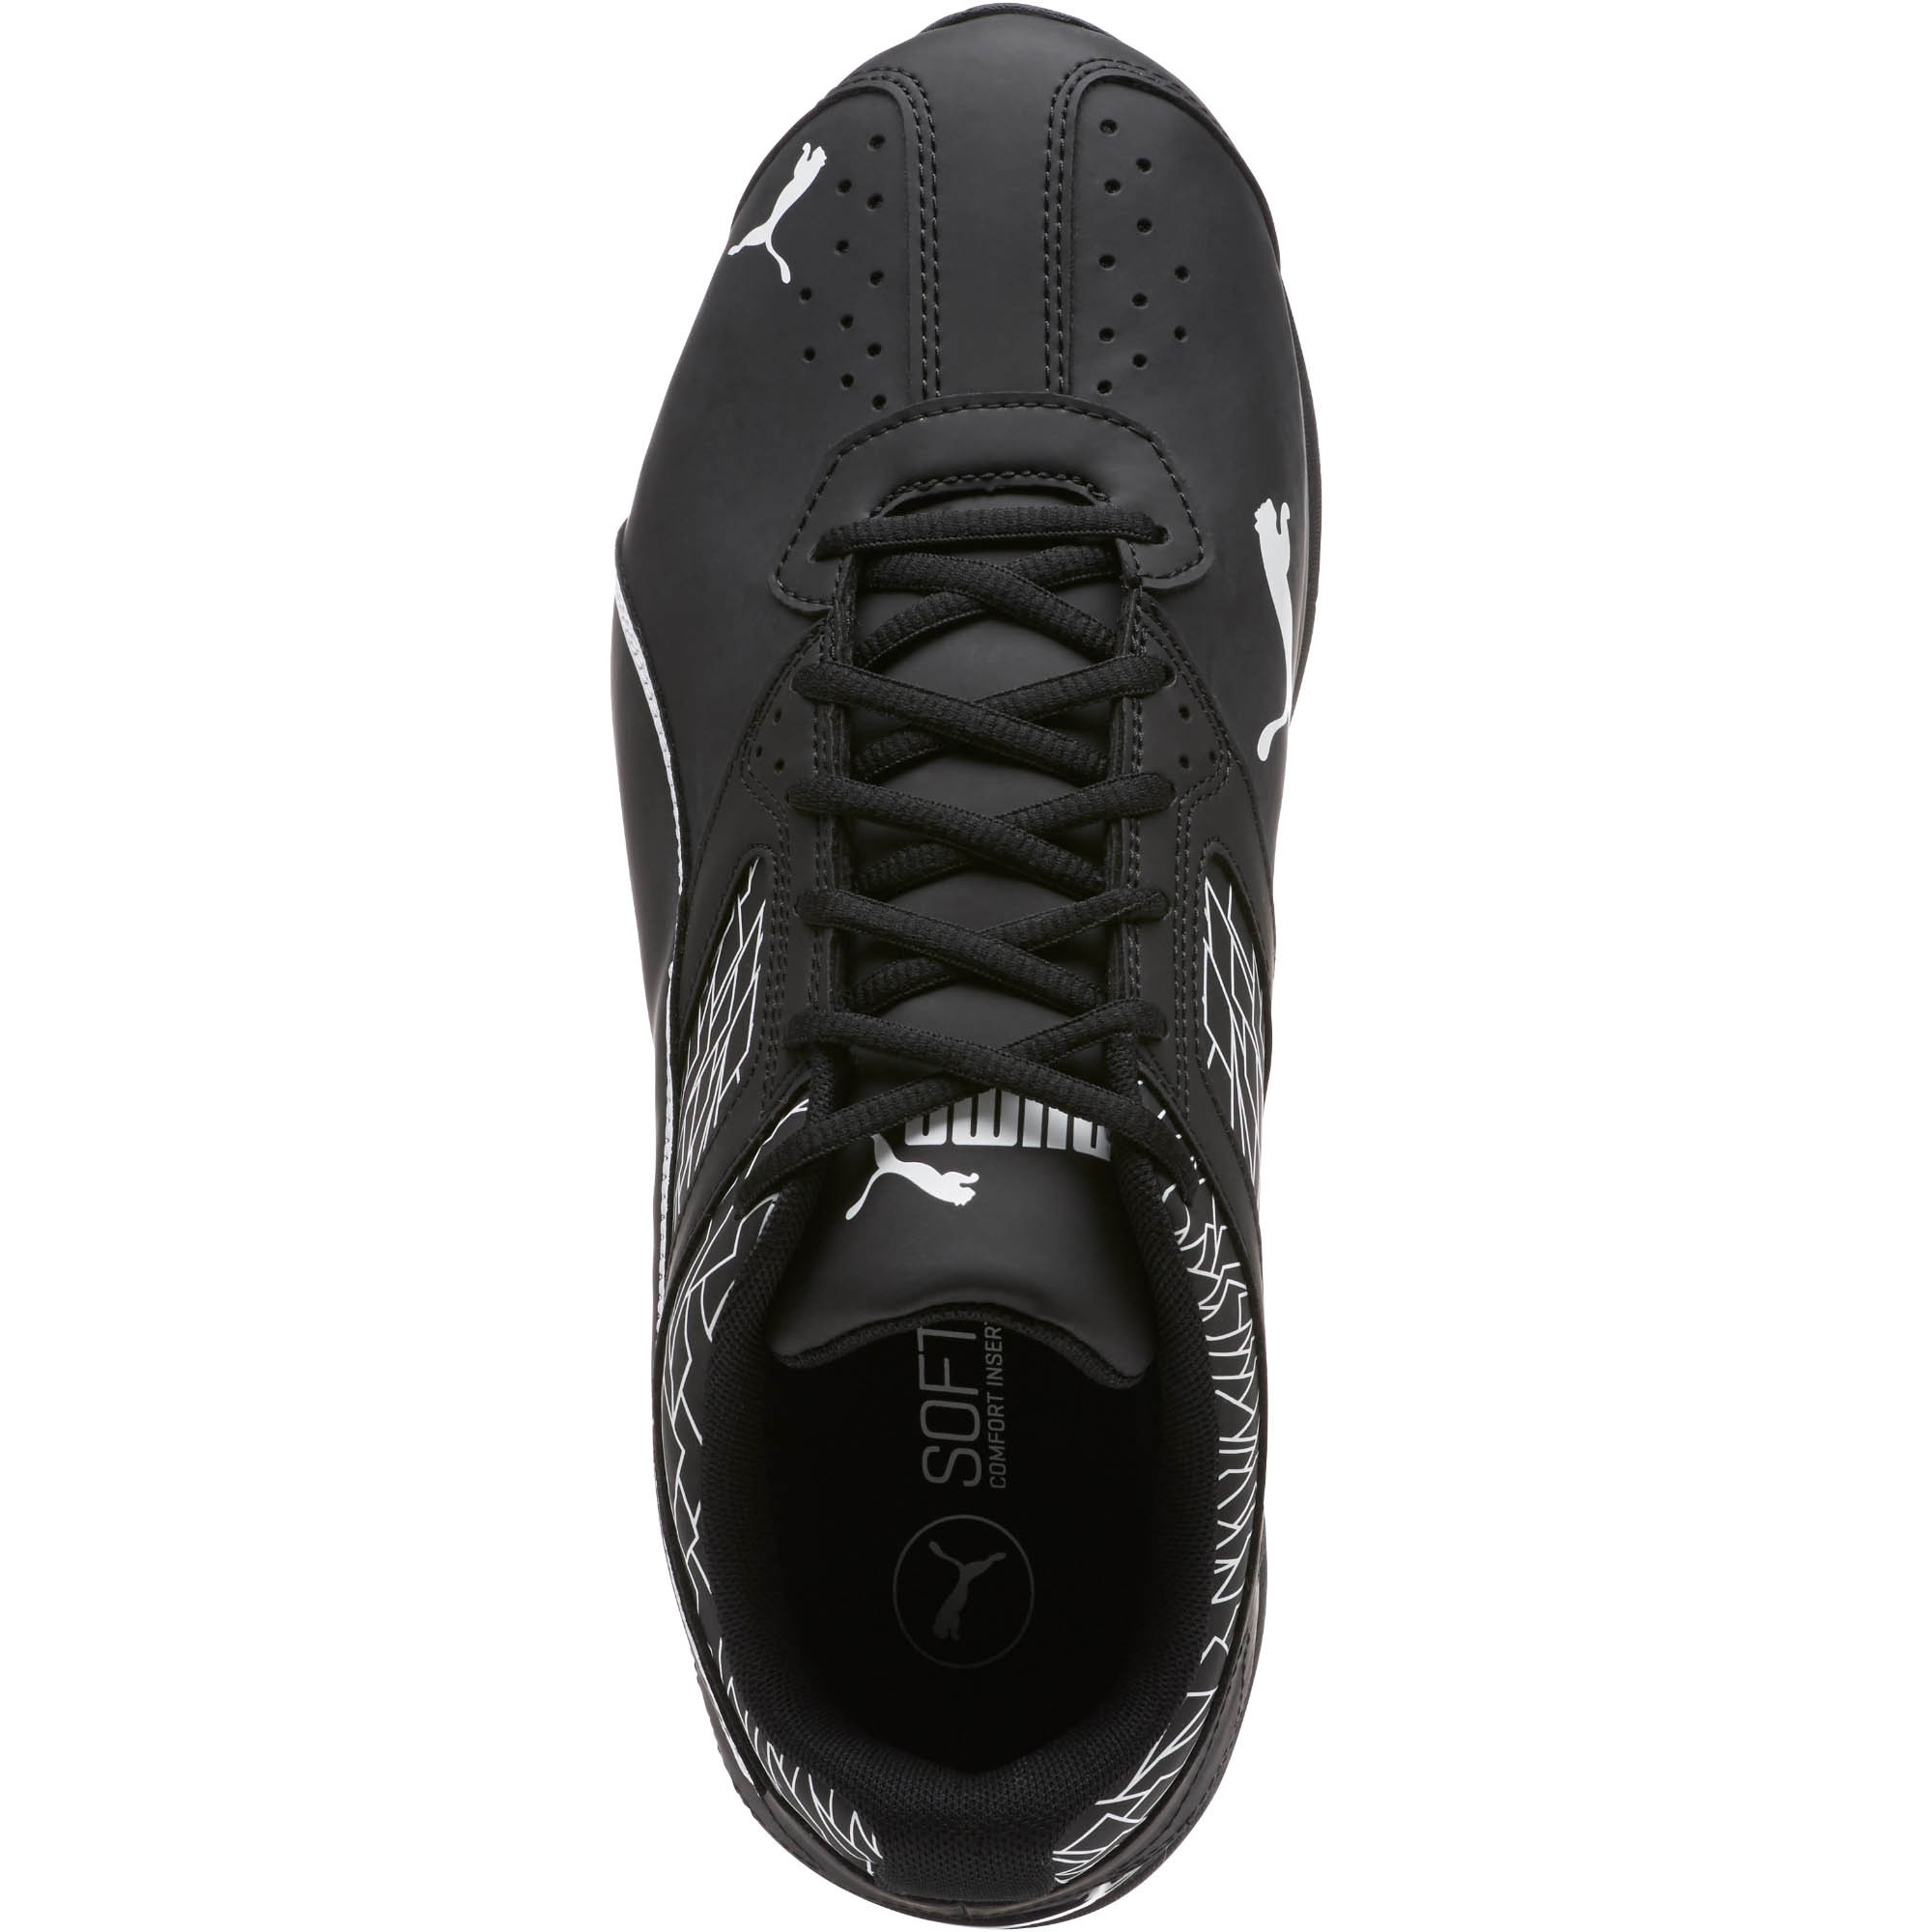 PUMA-Men-039-s-Tazon-6-Fracture-FM-Wide-Sneakers miniatura 6